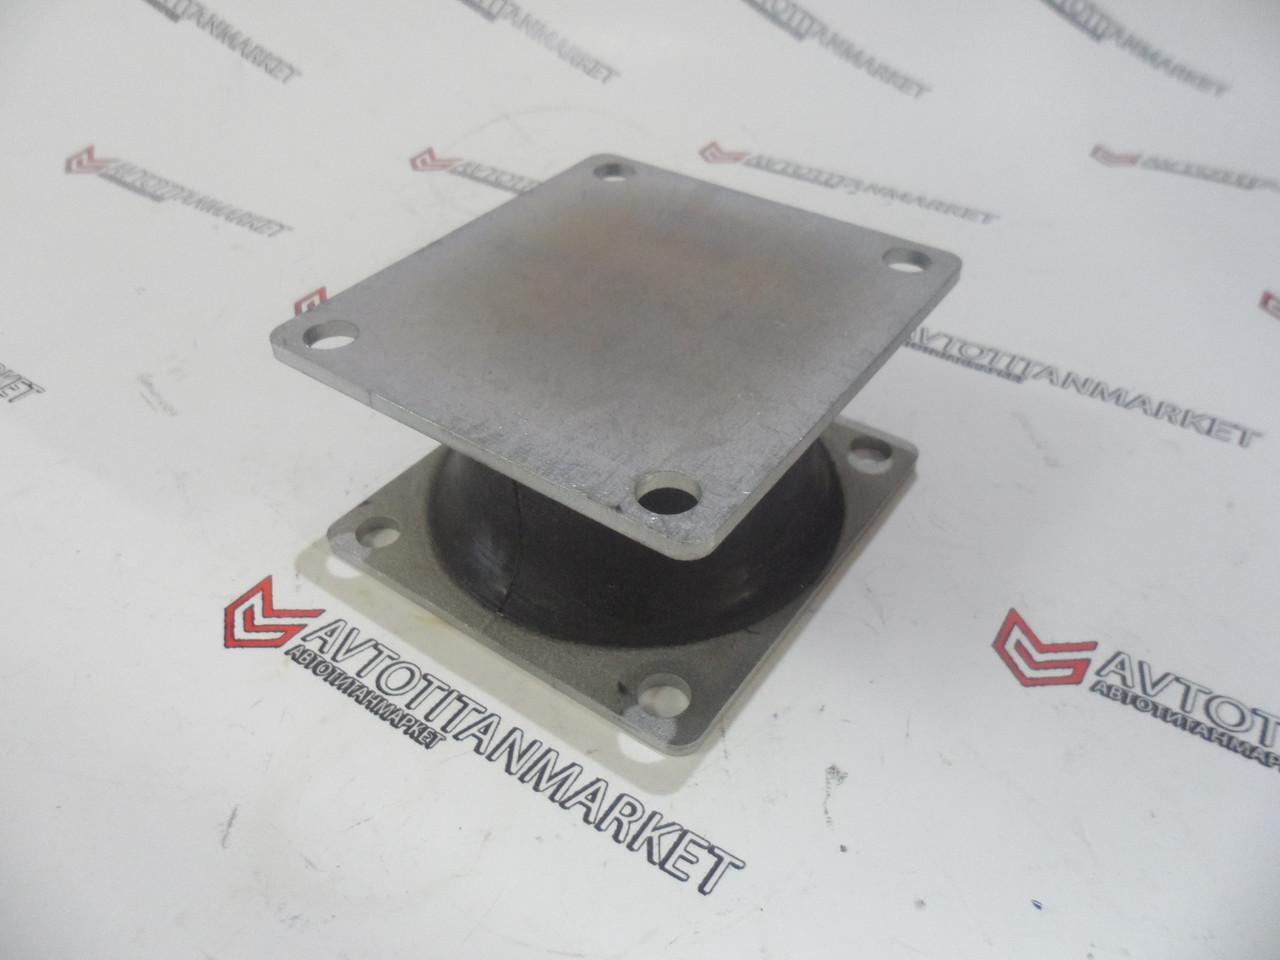 Виброопоры / подушки Dynapac 345215 (345315, 374244) для катков Dynapac CC10, CC105, CC222, CC322, 4700345215